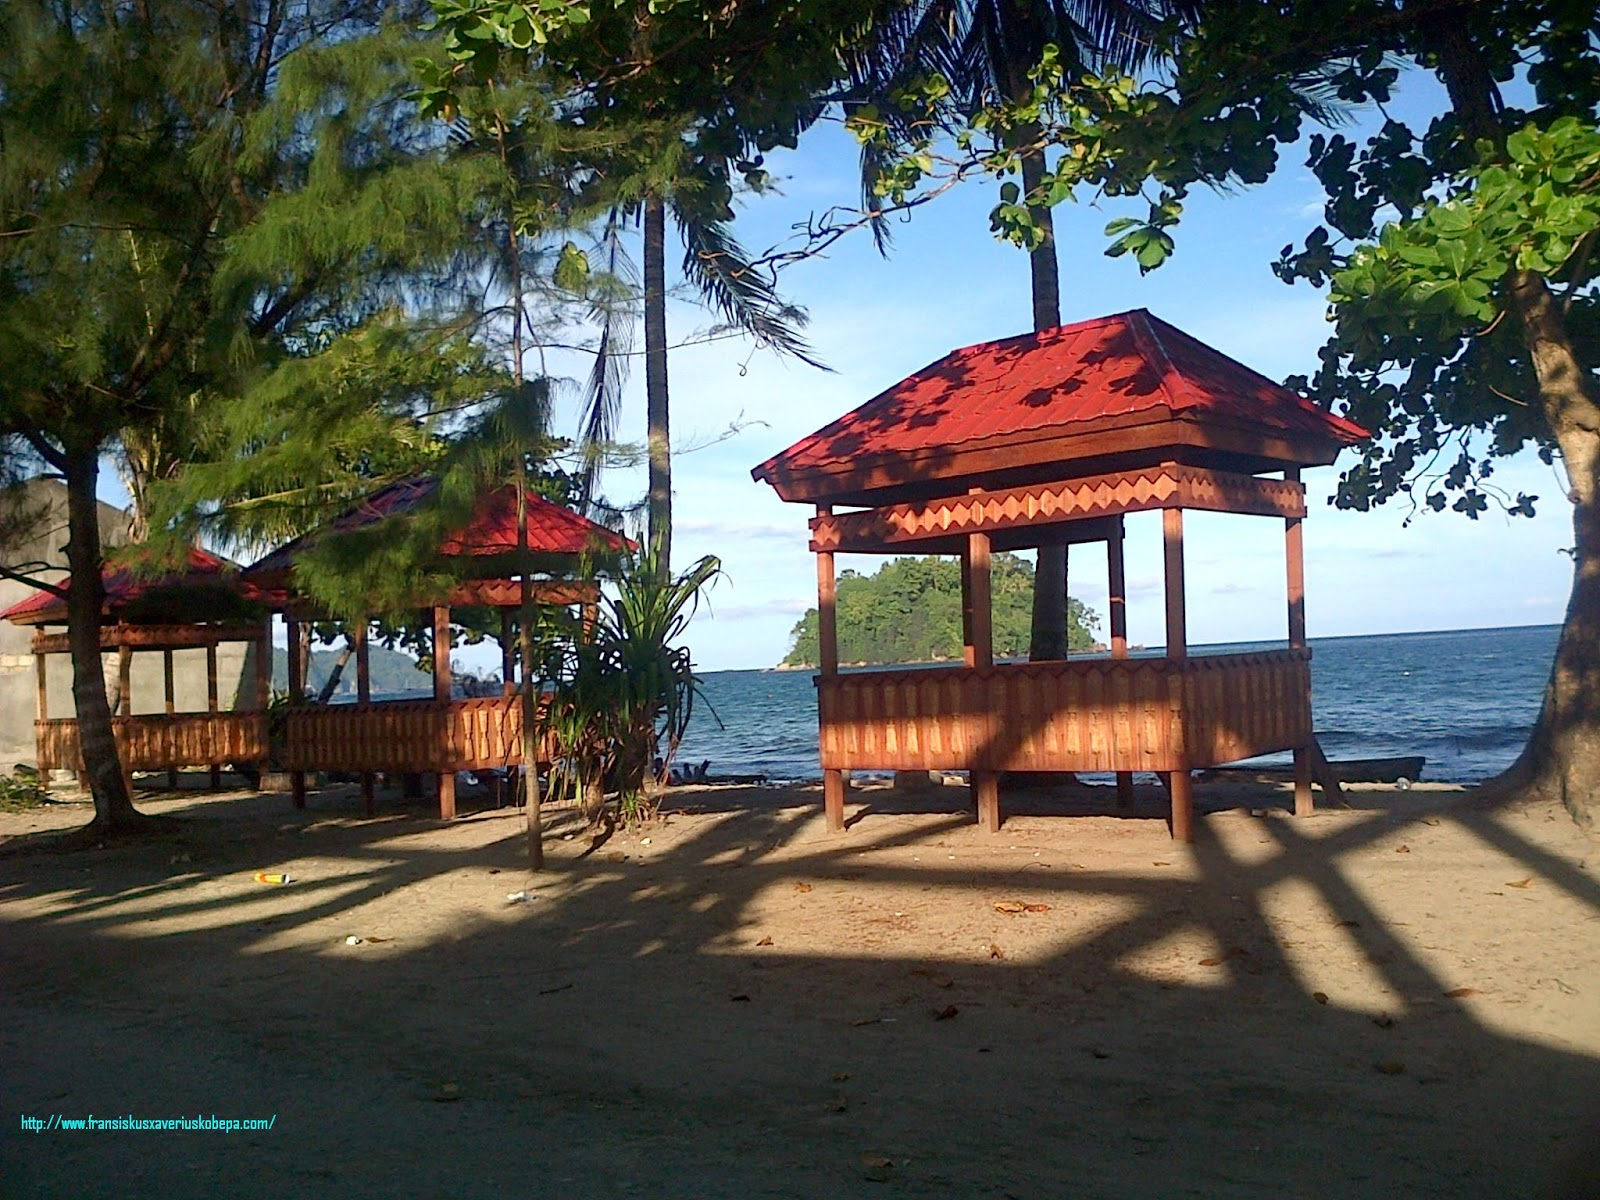 Object Moved Tercatat Sejumlah Destinasi Wisata Kota Jayapua Layak Dipamerkan